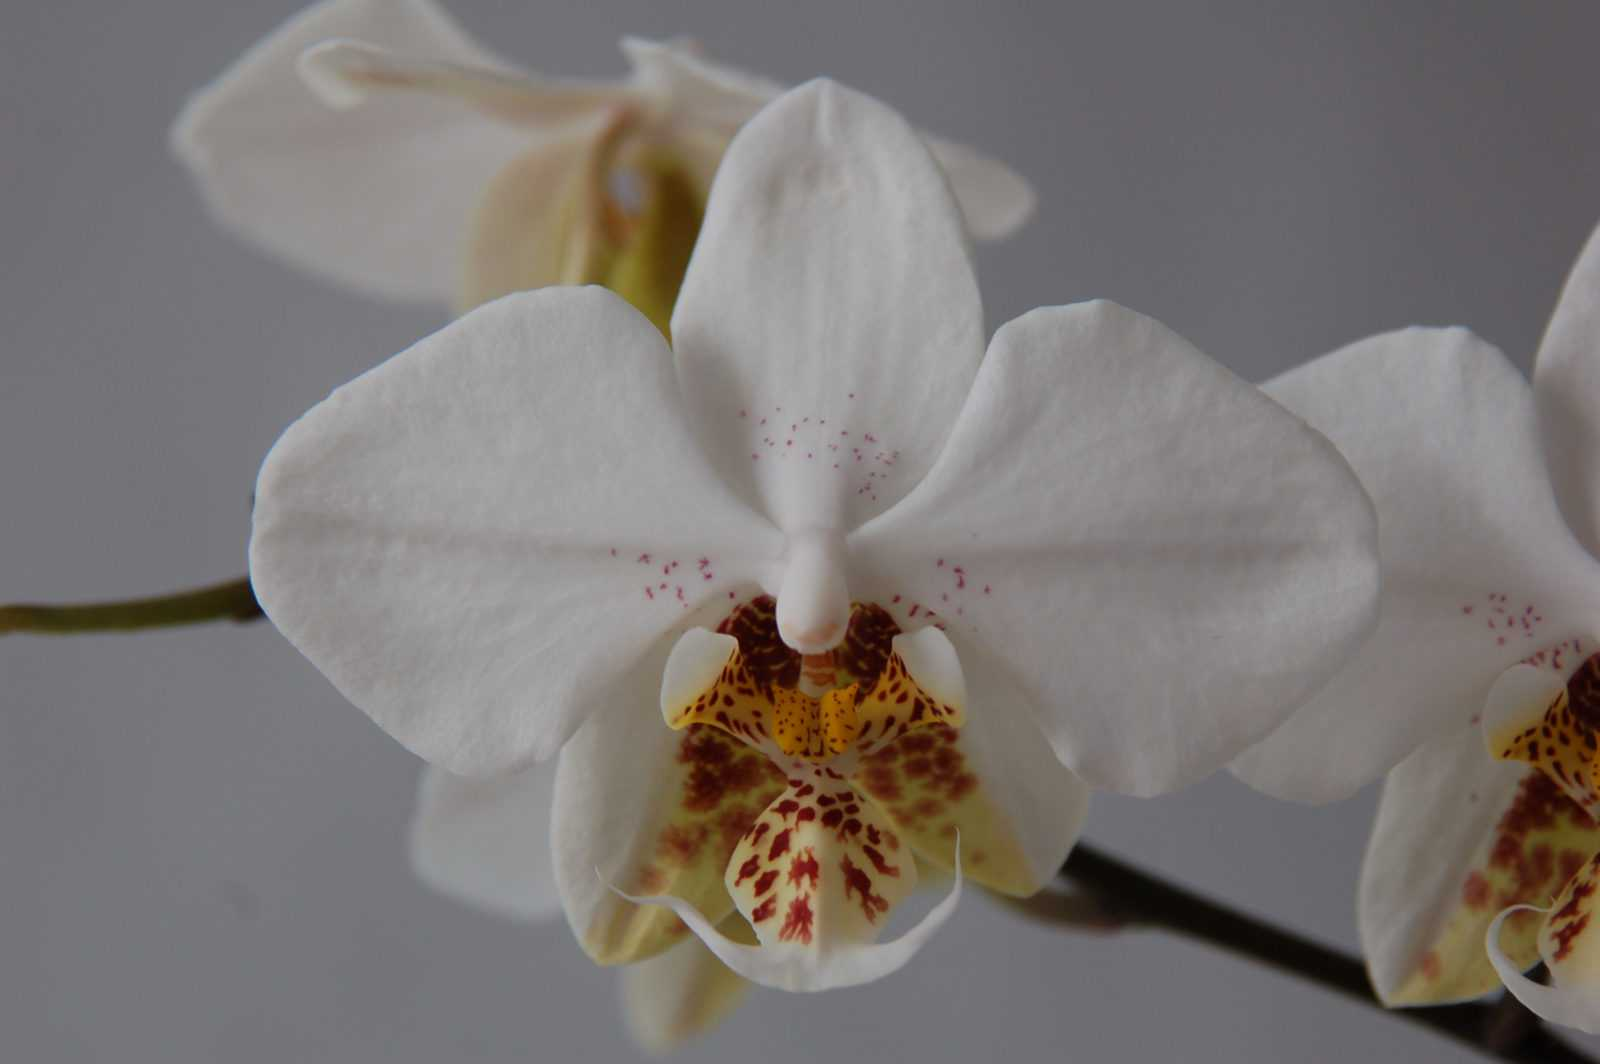 orhideya-falenopsis-foto-video-vidyi-falenopsis-harakteristika-i-opisanie-23